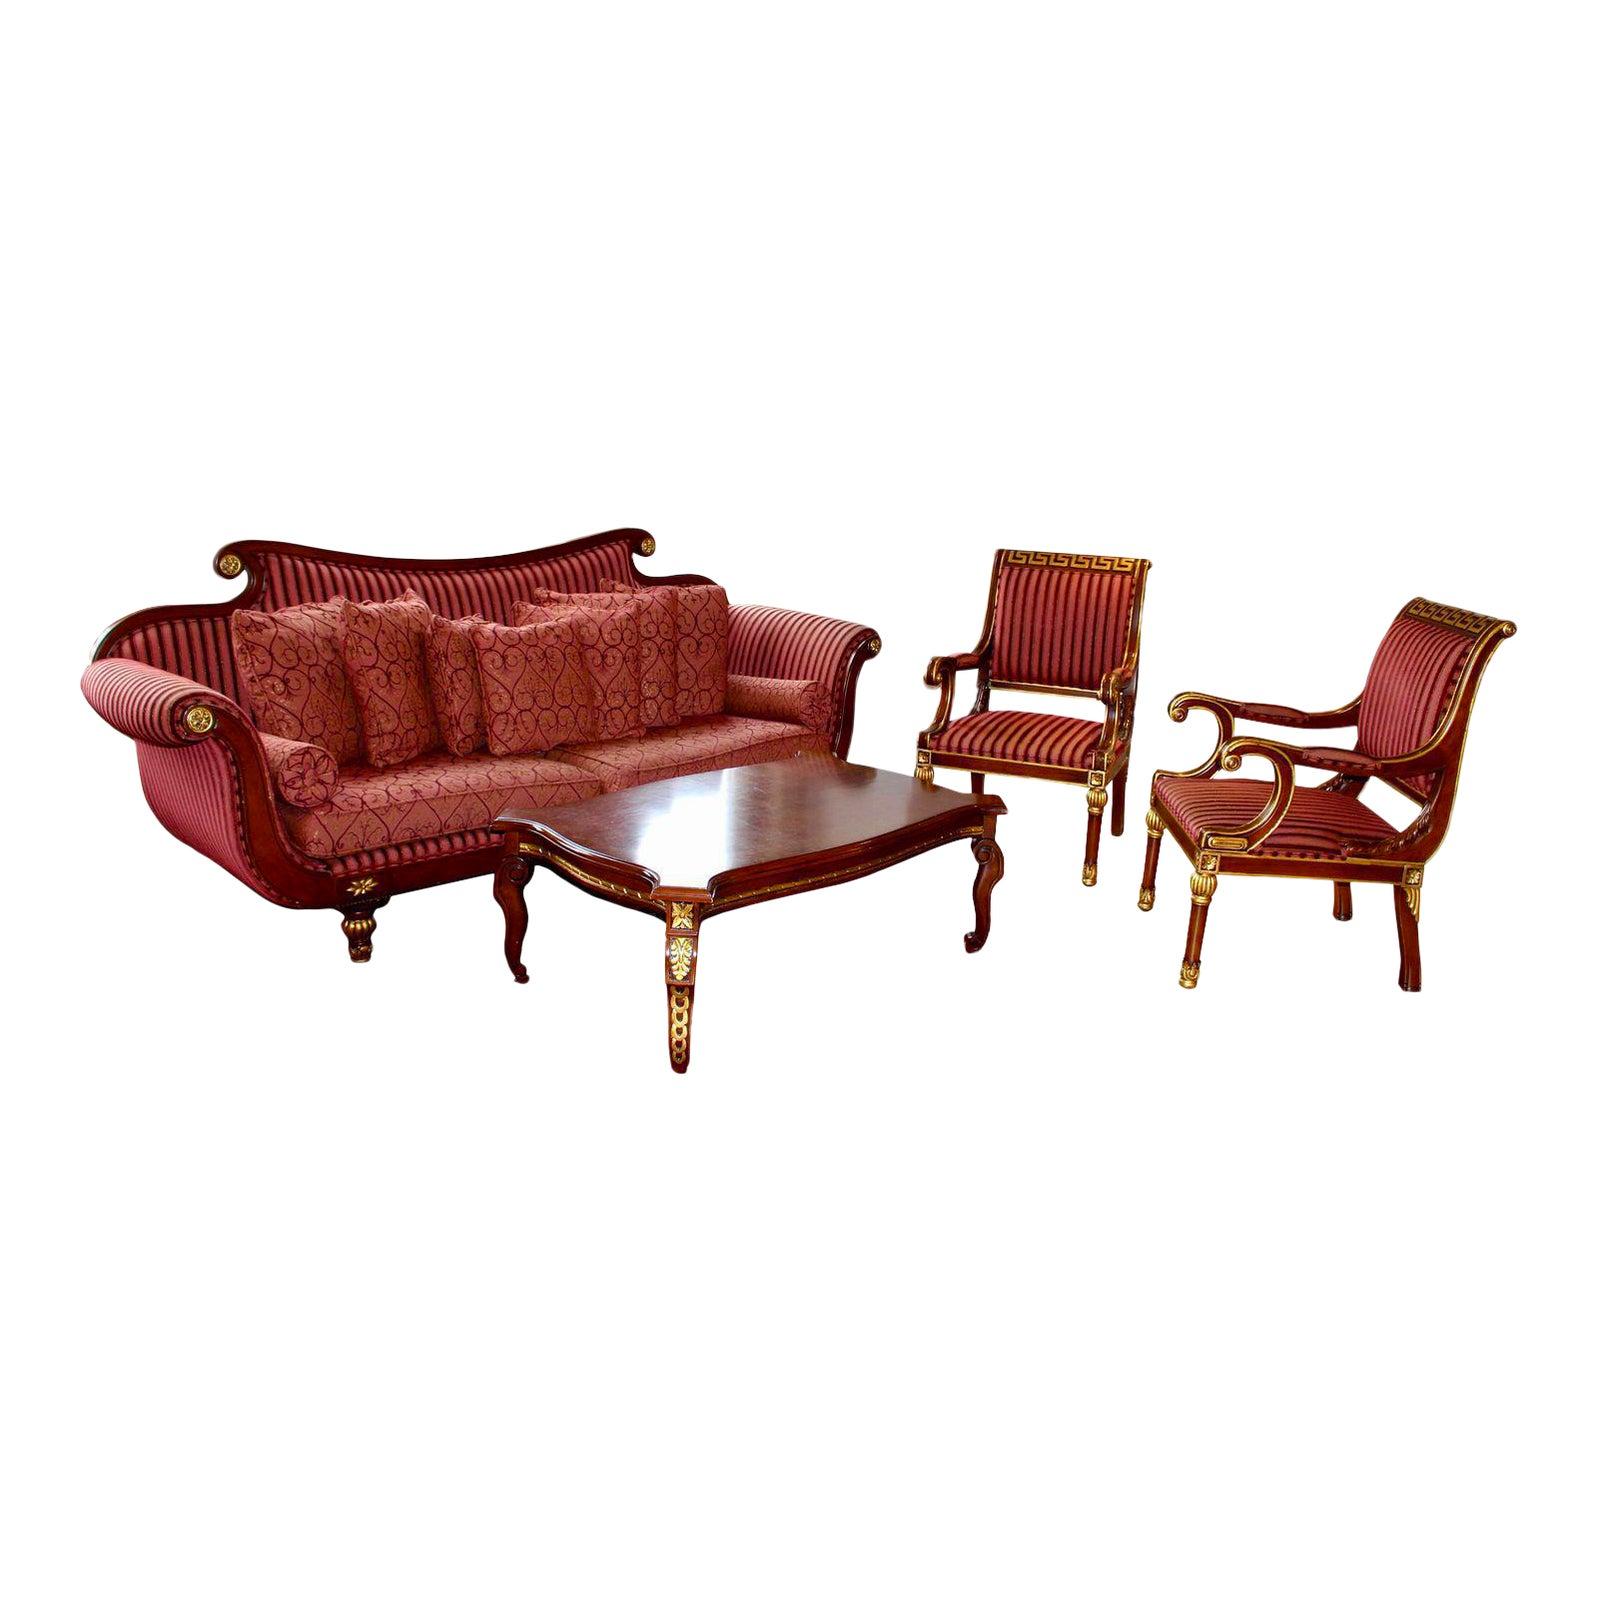 Turkish Custom Hand Crafted Living Room Set - 4 Pc. | Chairish